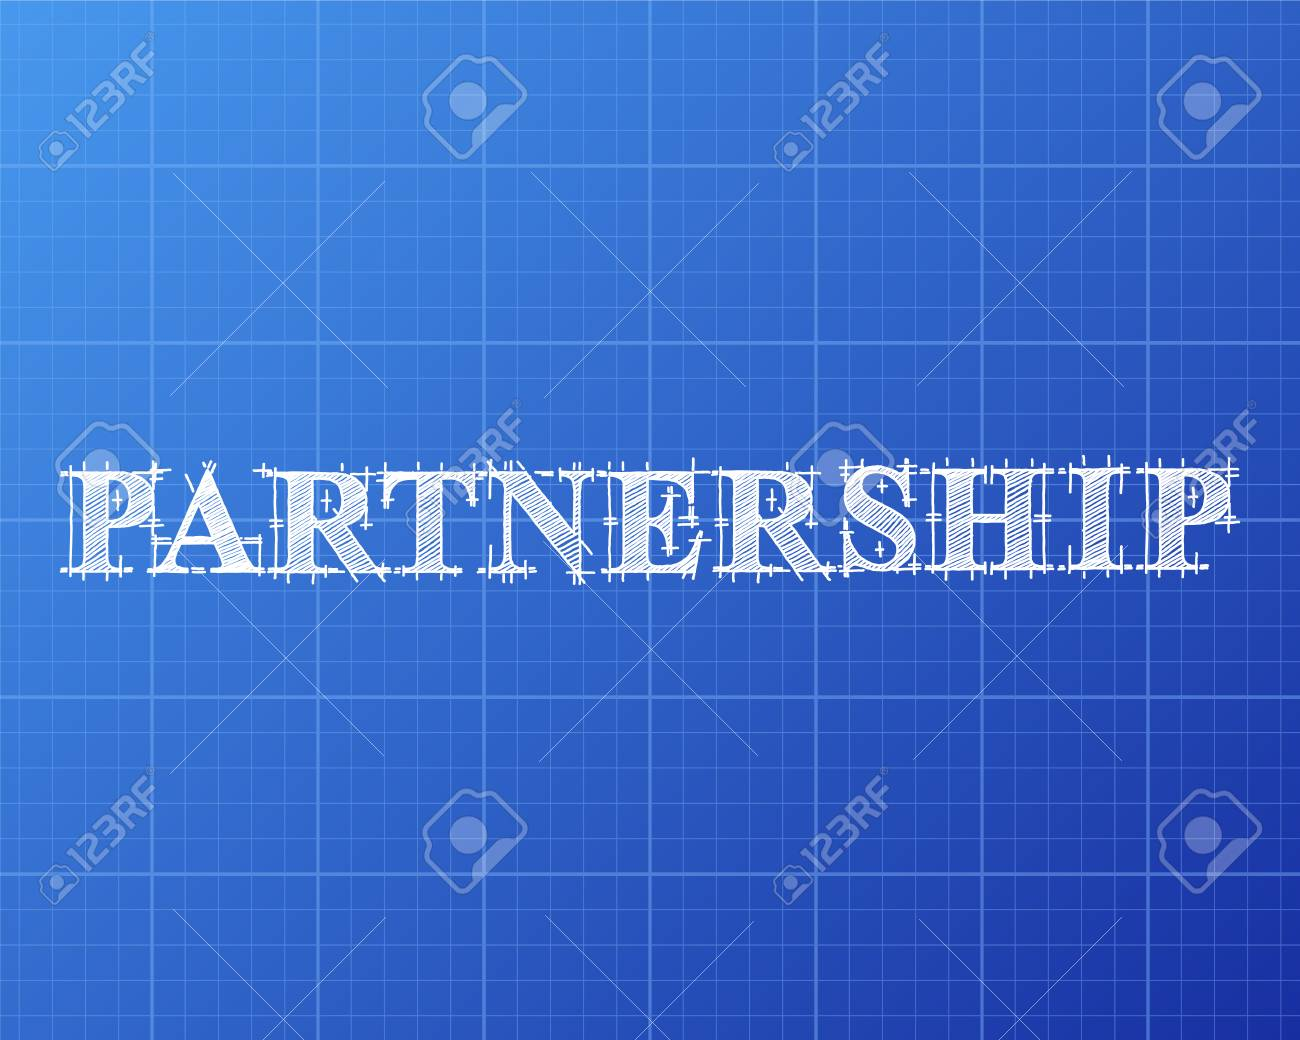 Partnership text hand drawn on blueprint background royalty free partnership text hand drawn on blueprint background stock vector 79651825 malvernweather Gallery